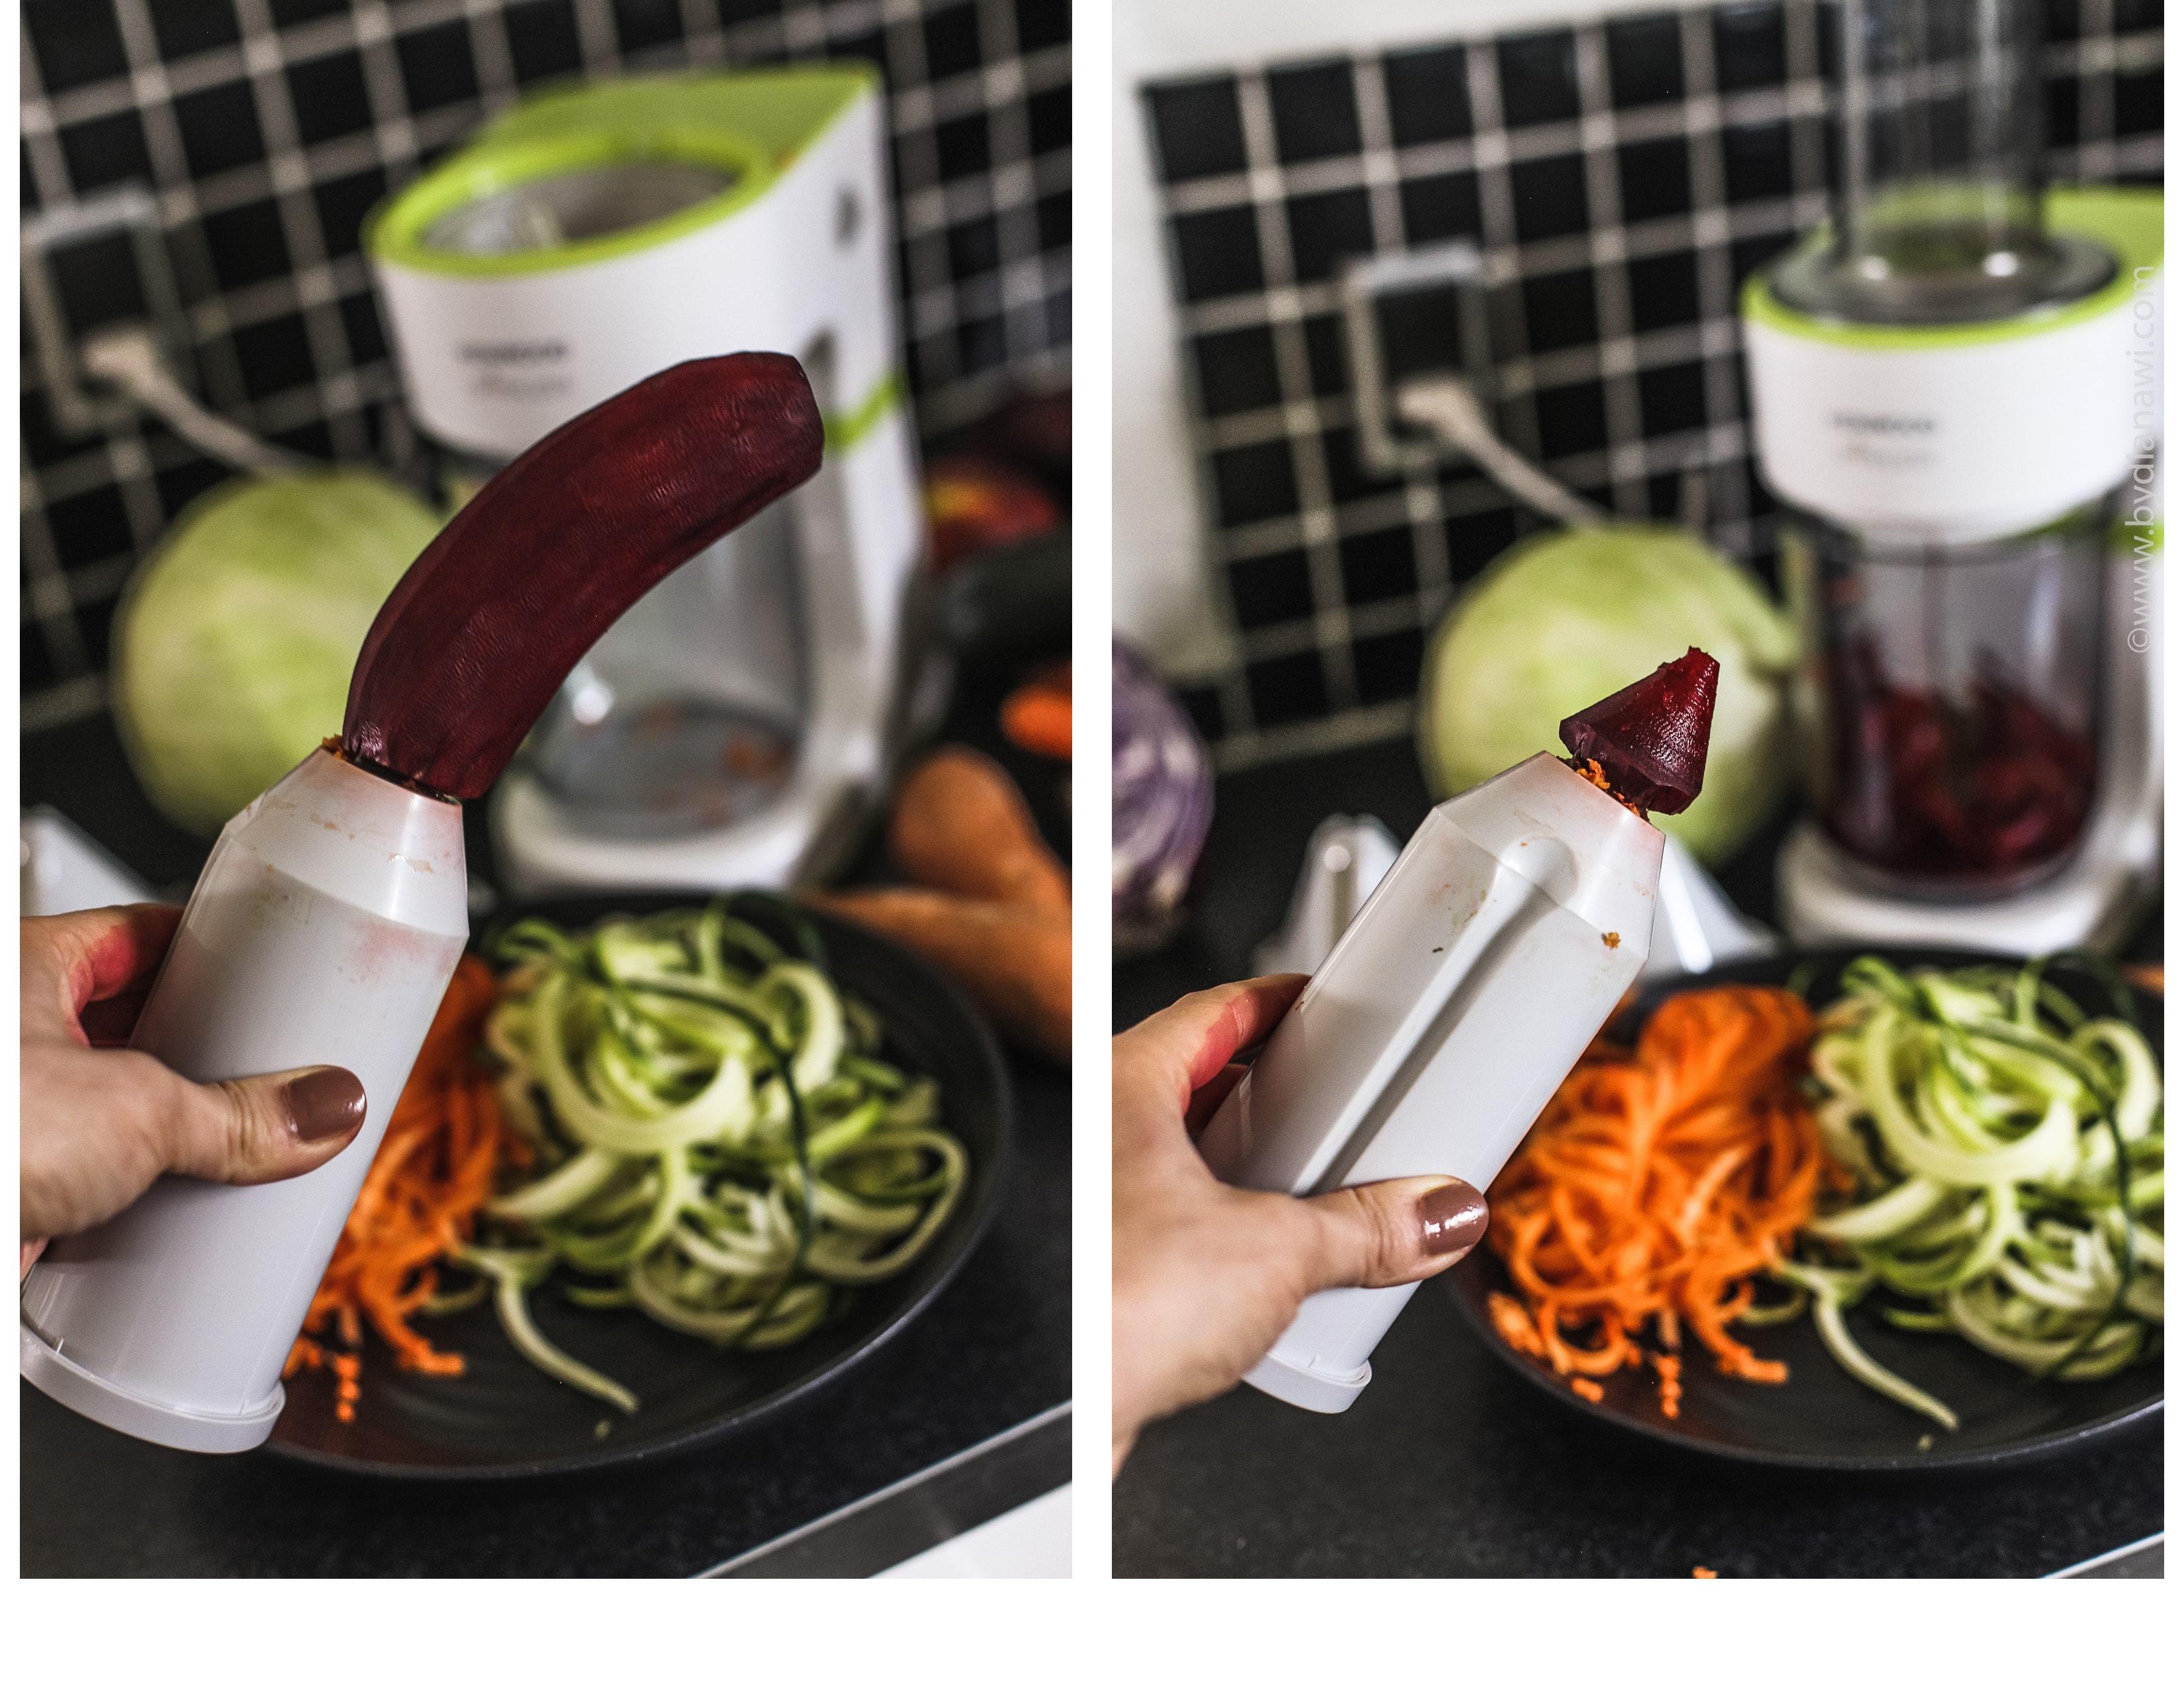 elektrisk spiralizer maskine Kenwood, grøntsagspasta maskine